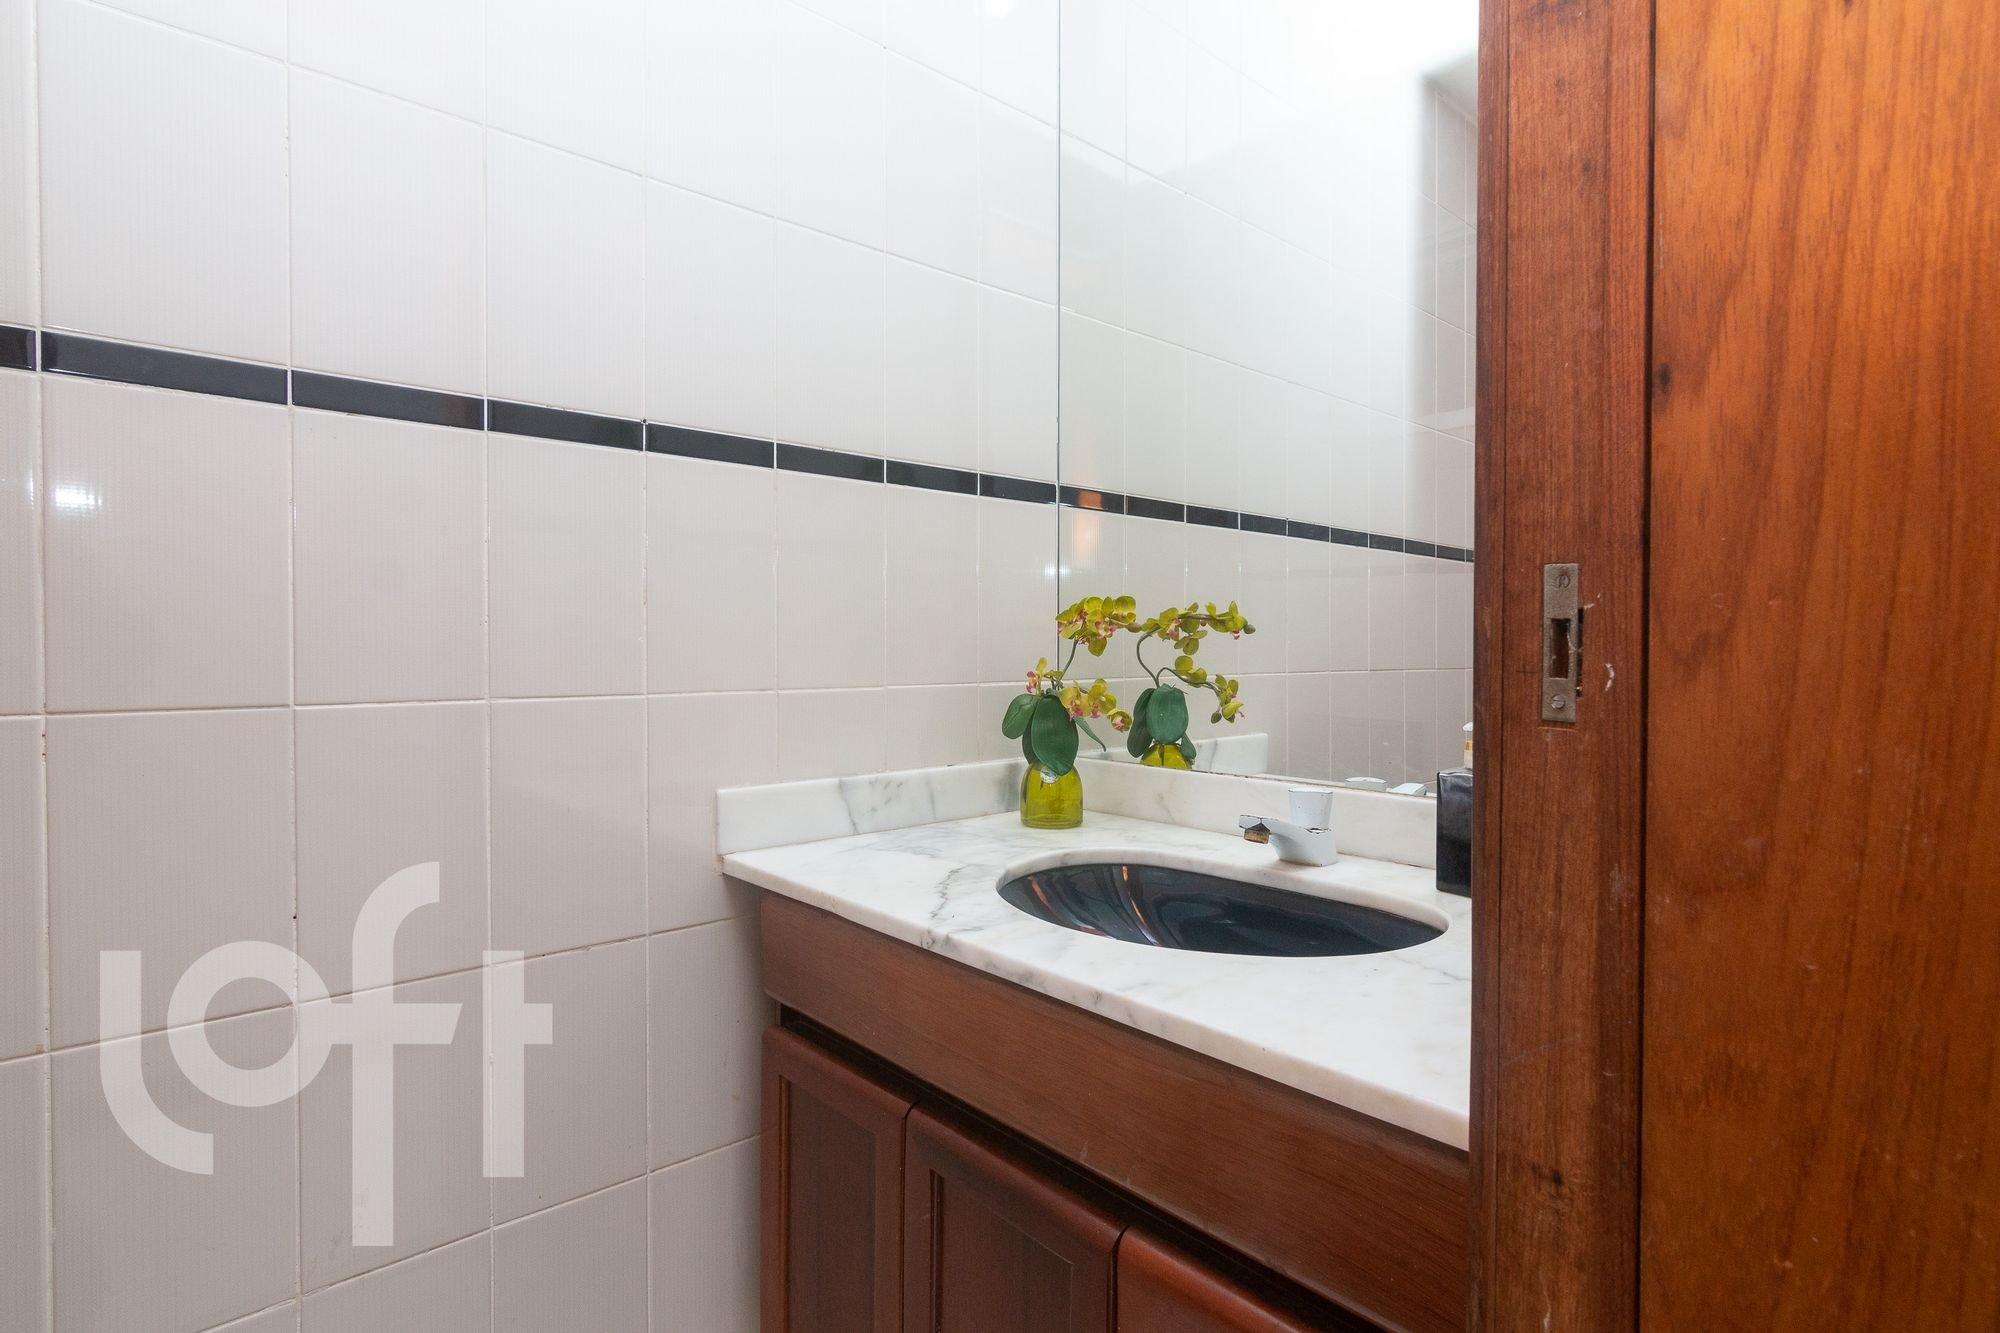 Foto de Banheiro com vaso de planta, vaso, pia